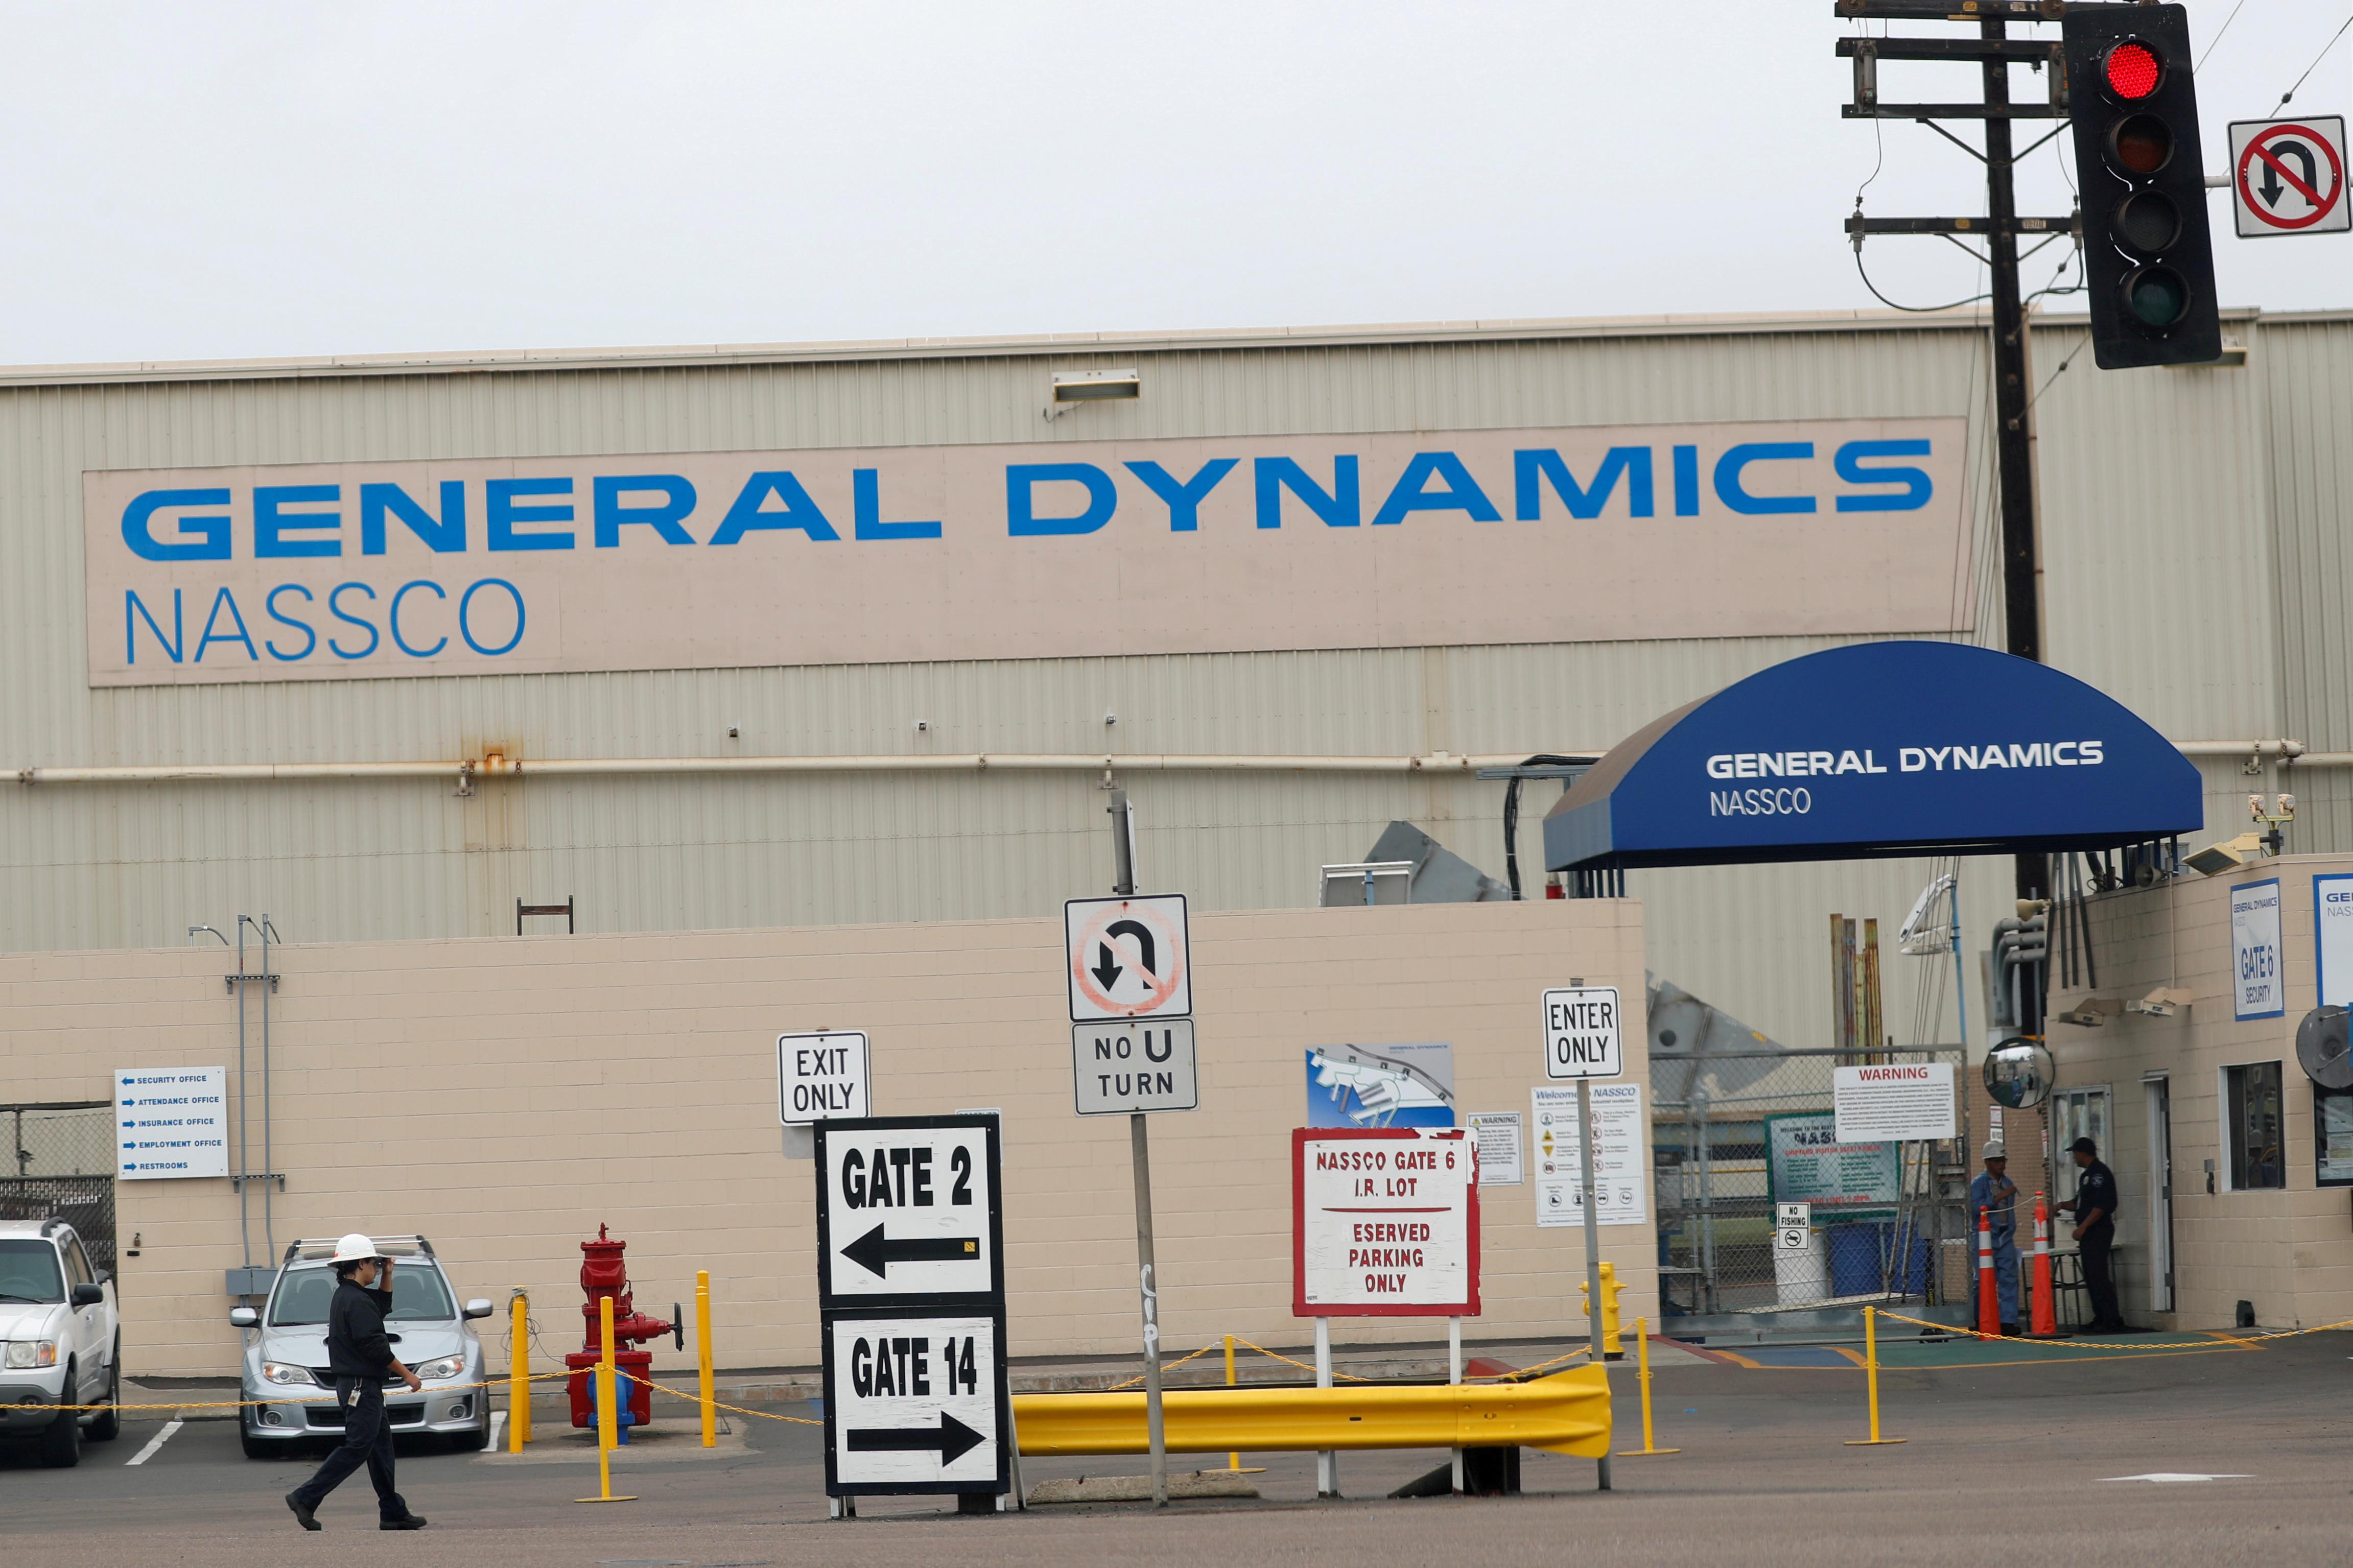 A General Dynamics NASSCO ship yard entrance is shown in San Diego, California, U.S., June 17, 2019. REUTERS/Mike Blake